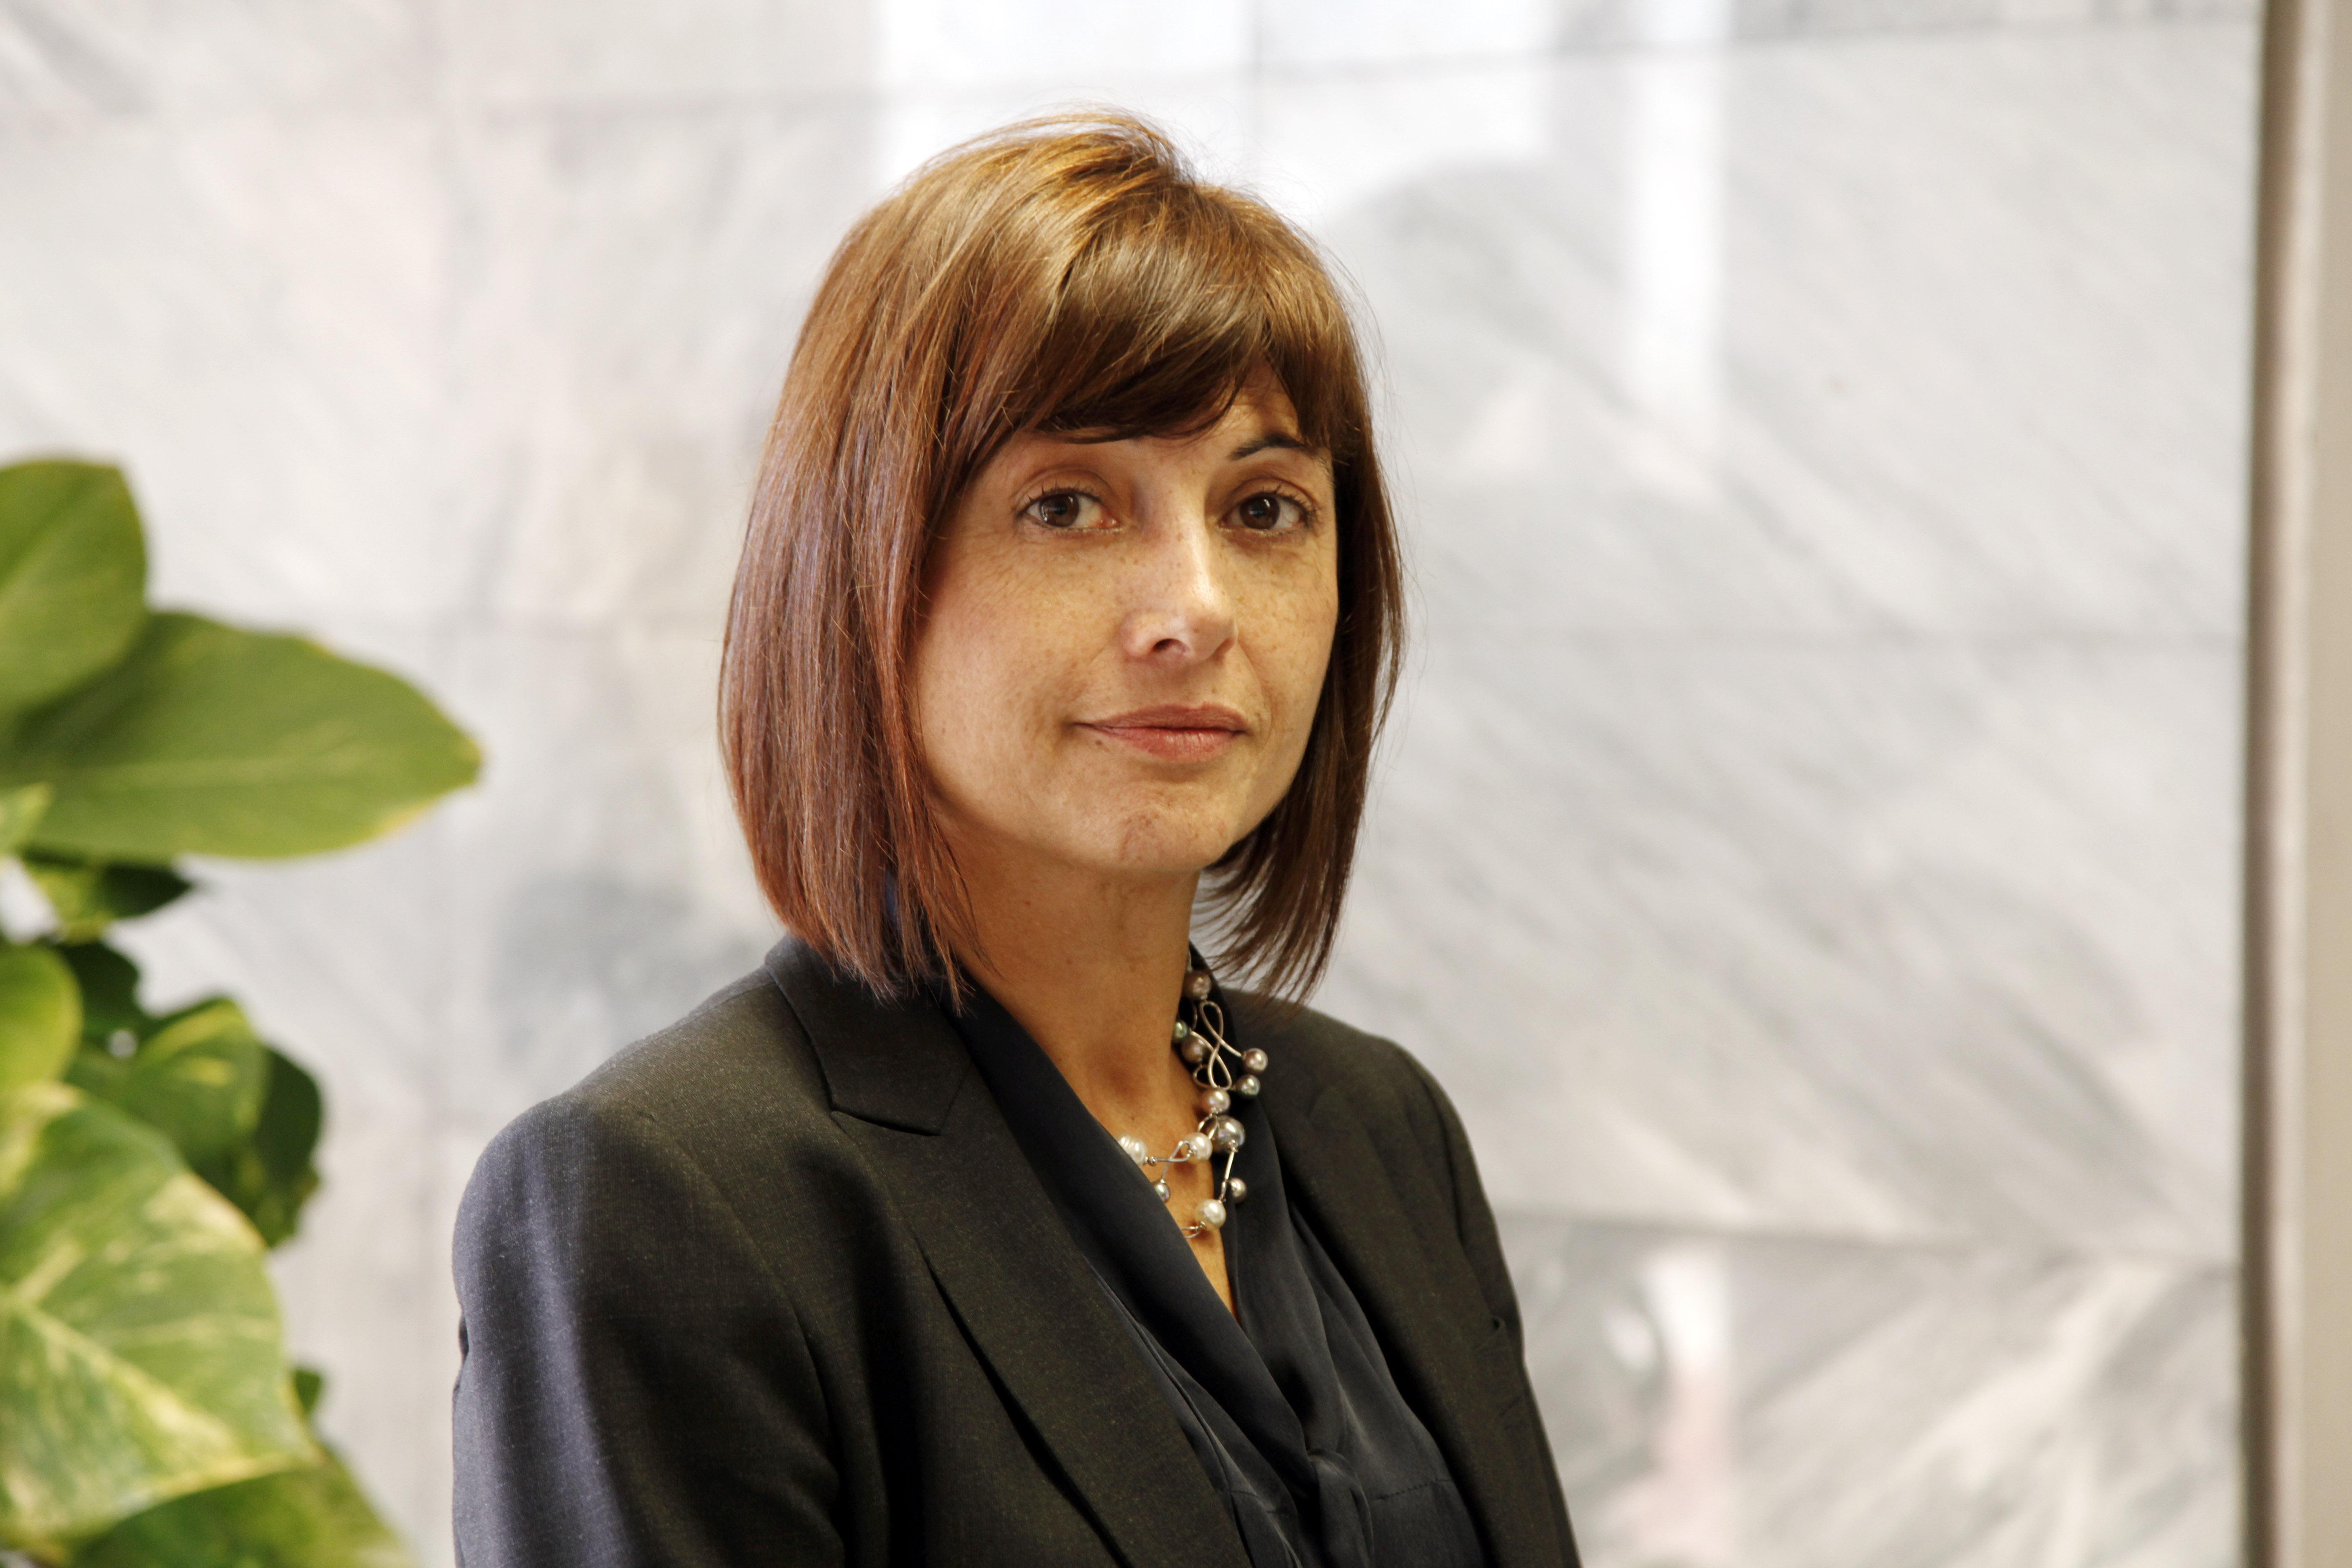 CENA WOMEN 360º CONGRESS CON LA DRA. MARINA GELI